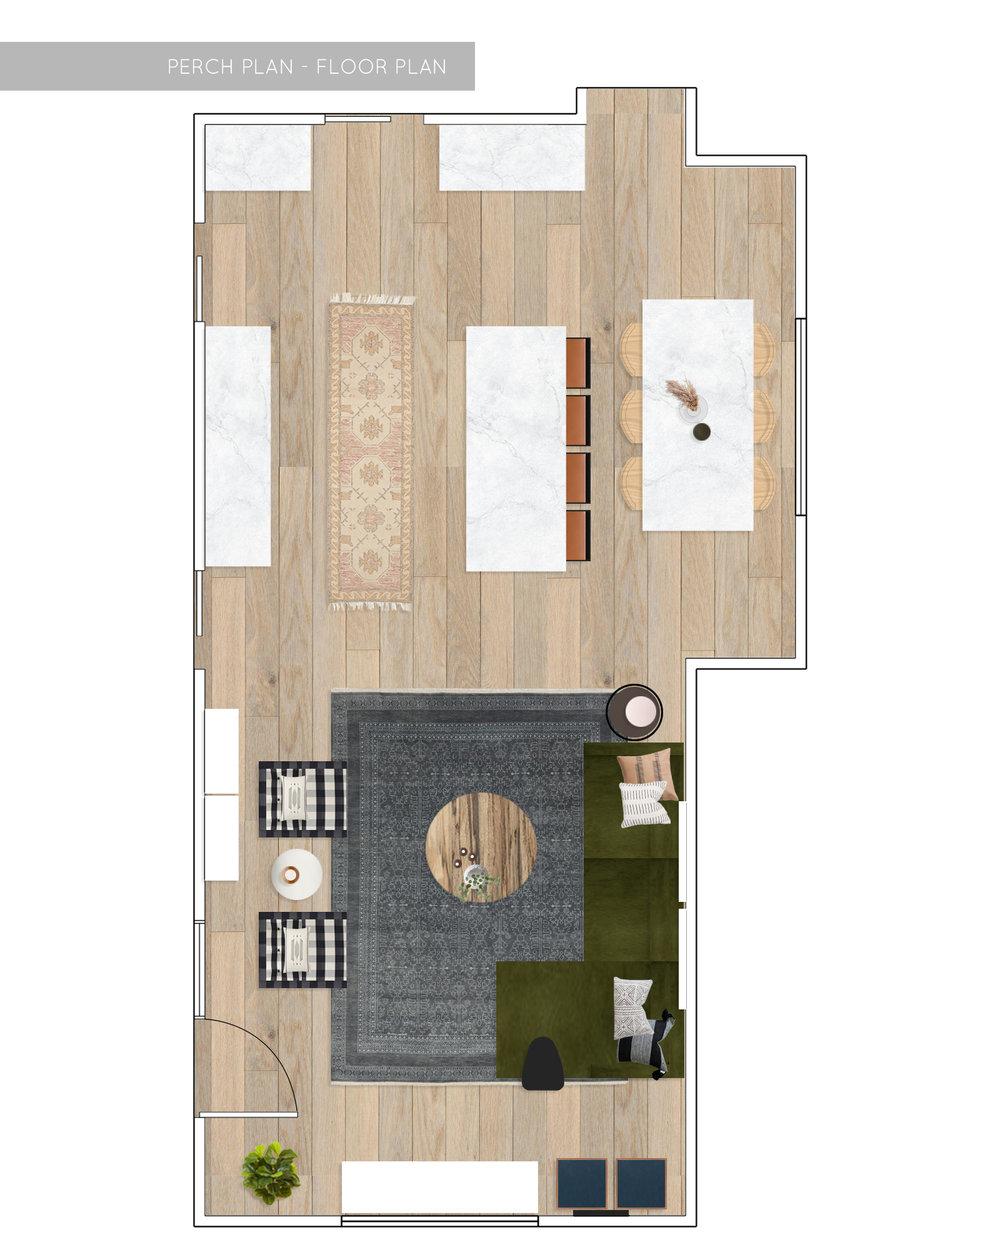 Love Ding_Blog_Spruce_Kit_Modern_Farmhouse_Design.jpg